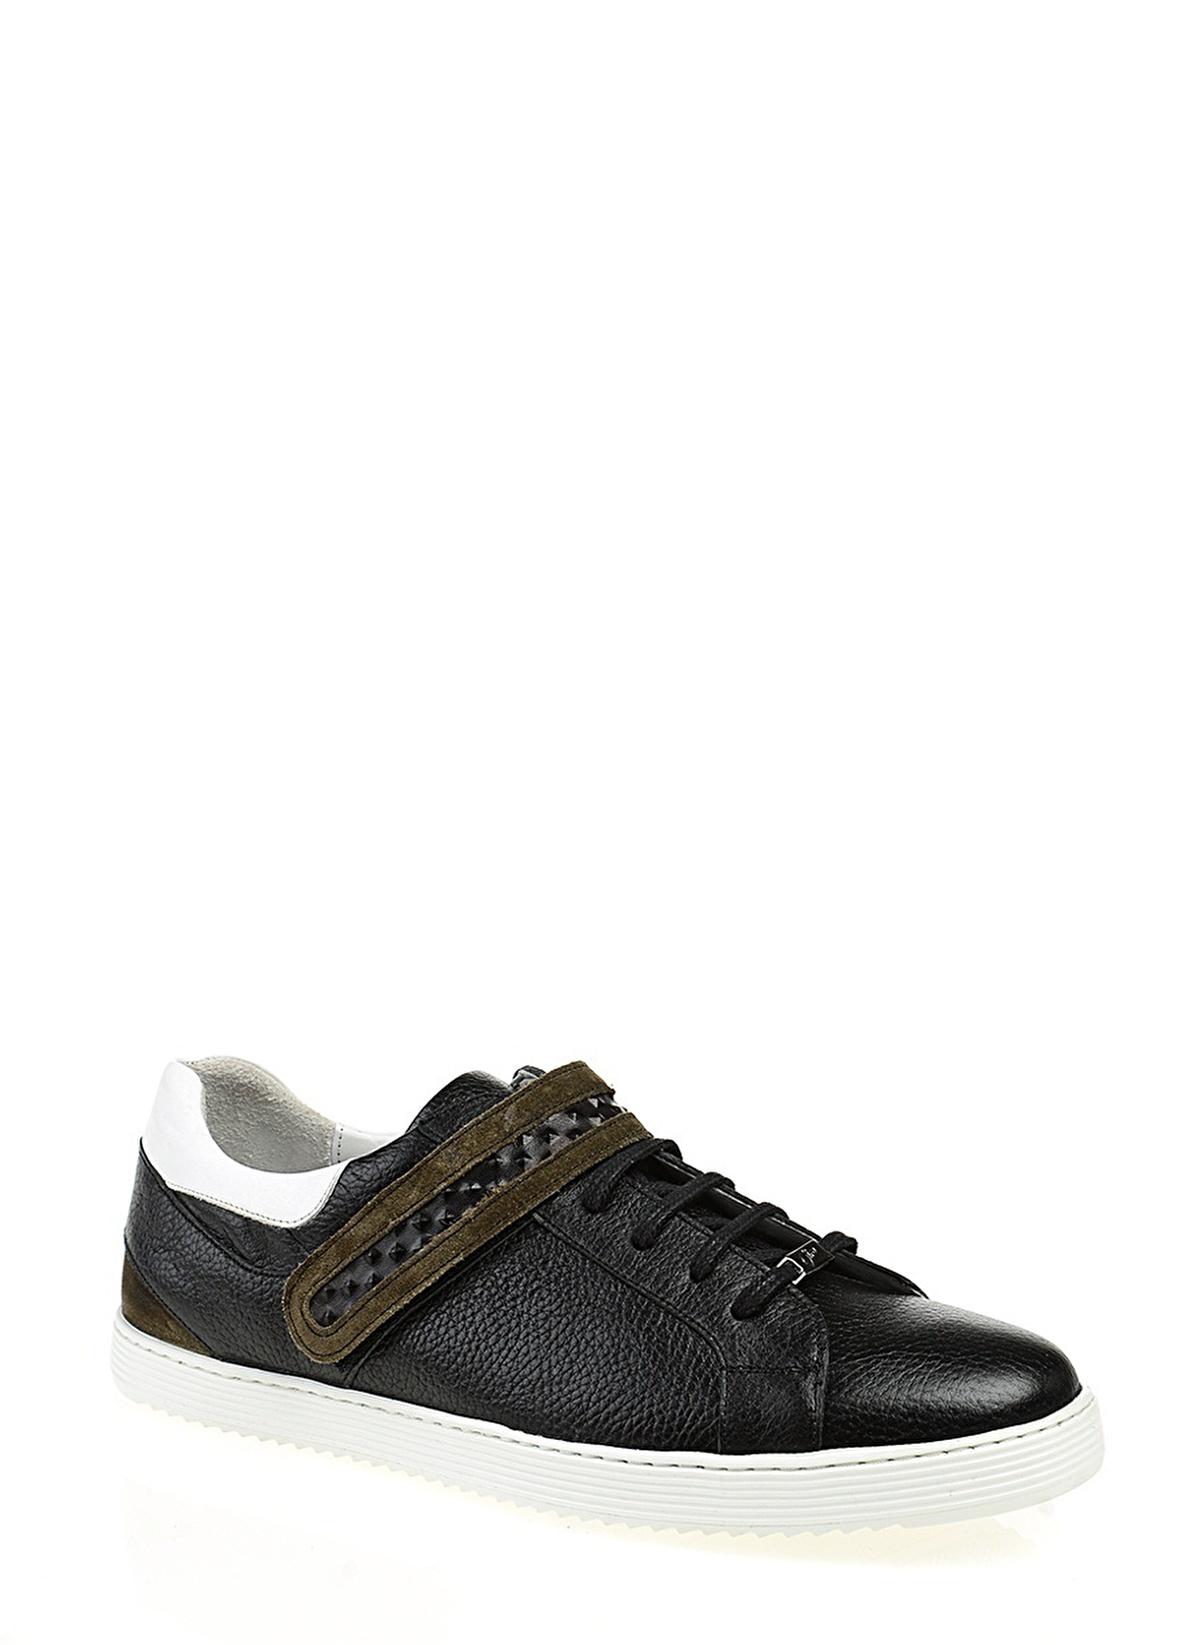 Divarese Lifestyle Ayakkabı 5017398 E Sneaker – 185.0 TL